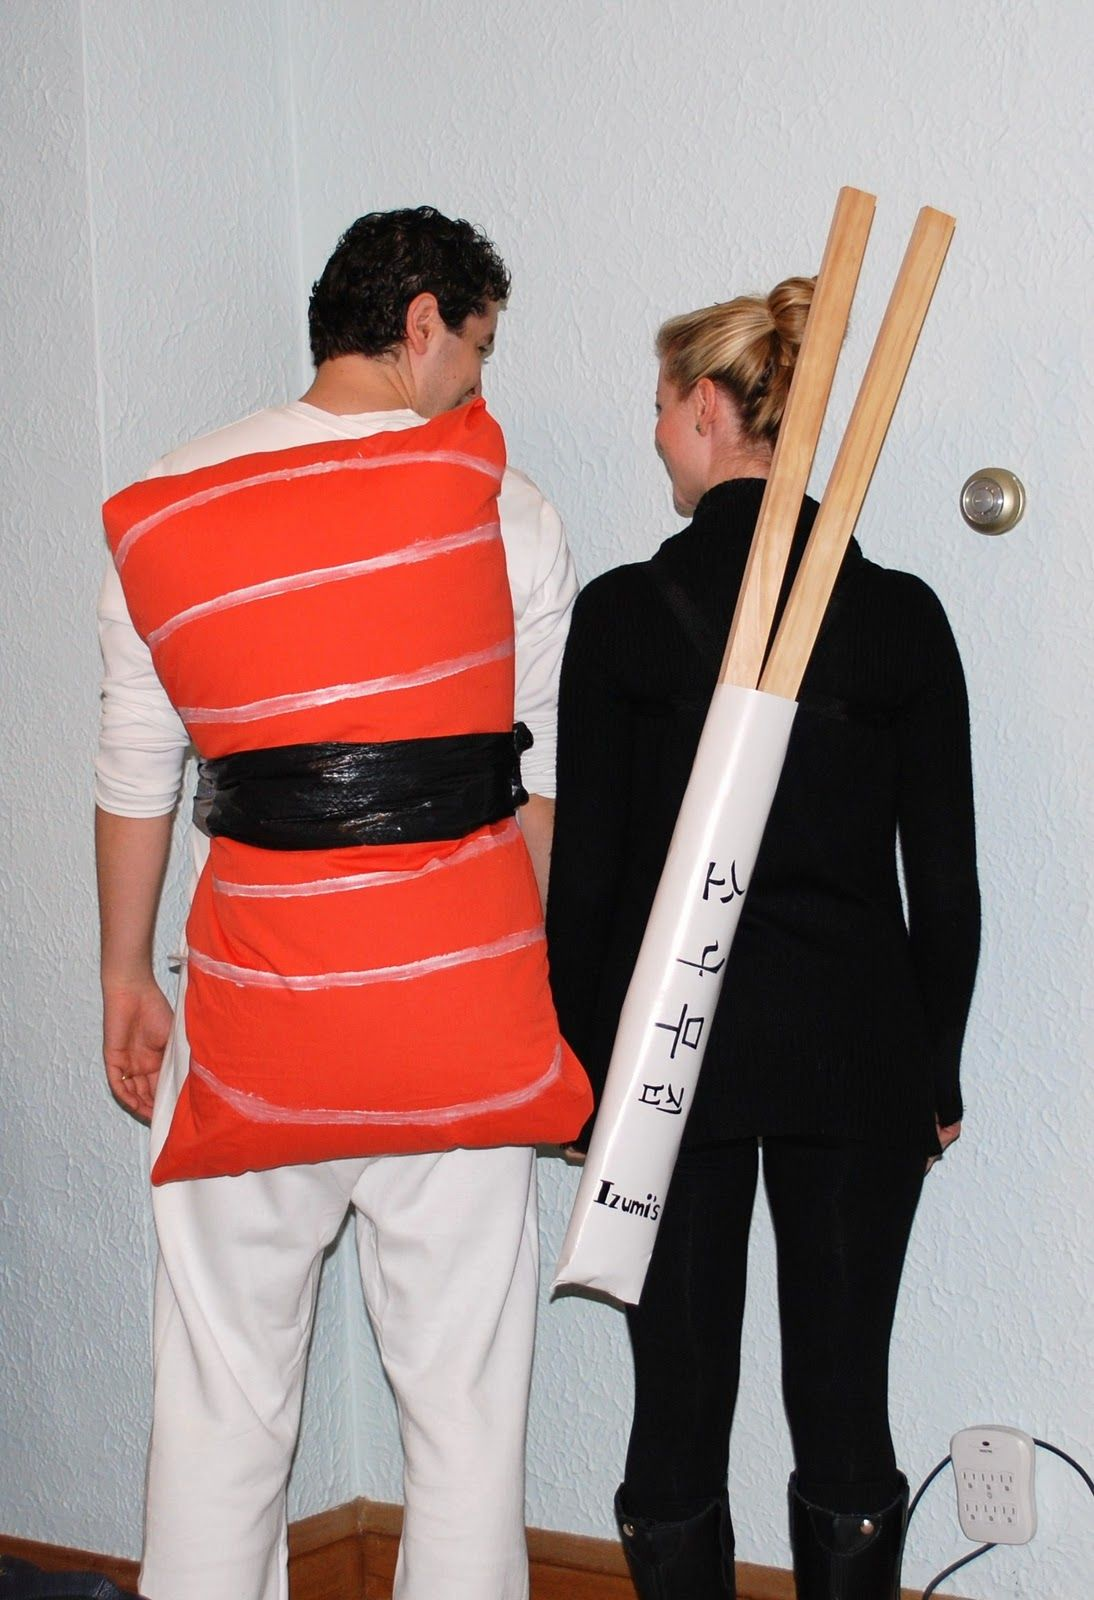 Nigiri Sushi Kostüm selber machen | Kostüme selber machen, Kostüm ...